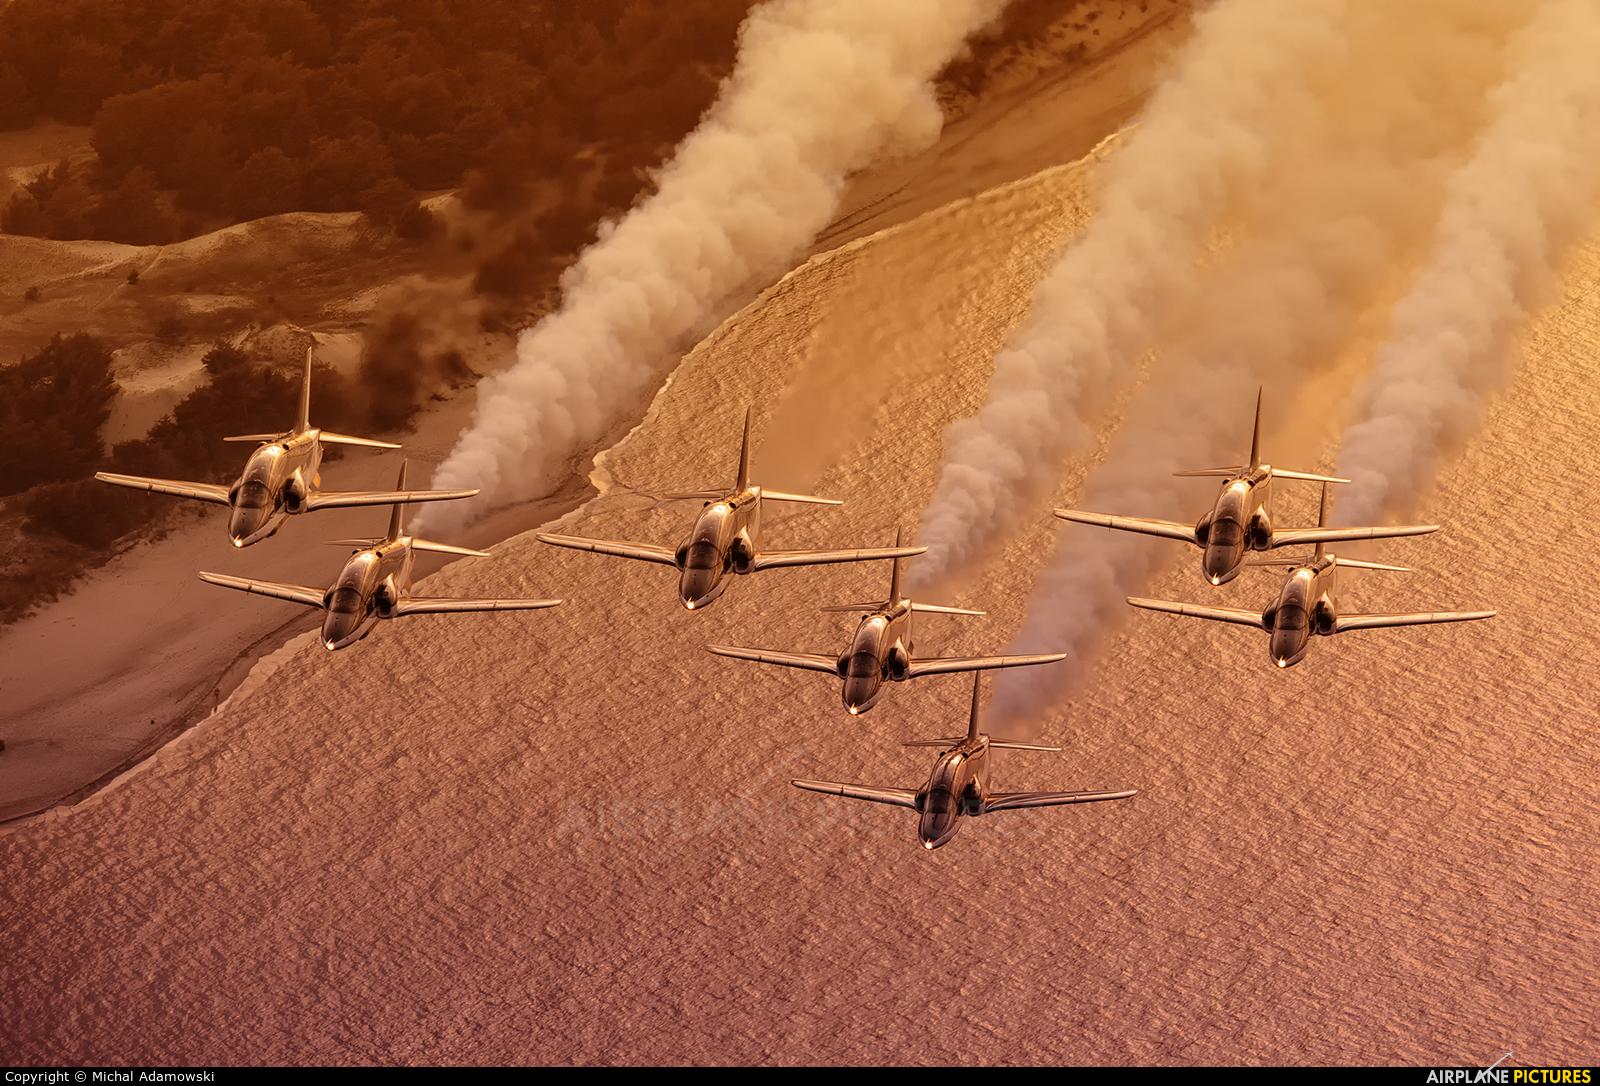 Saudi Arabia - Air Force: Saudi Hawks 8820 aircraft at In Flight - Poland